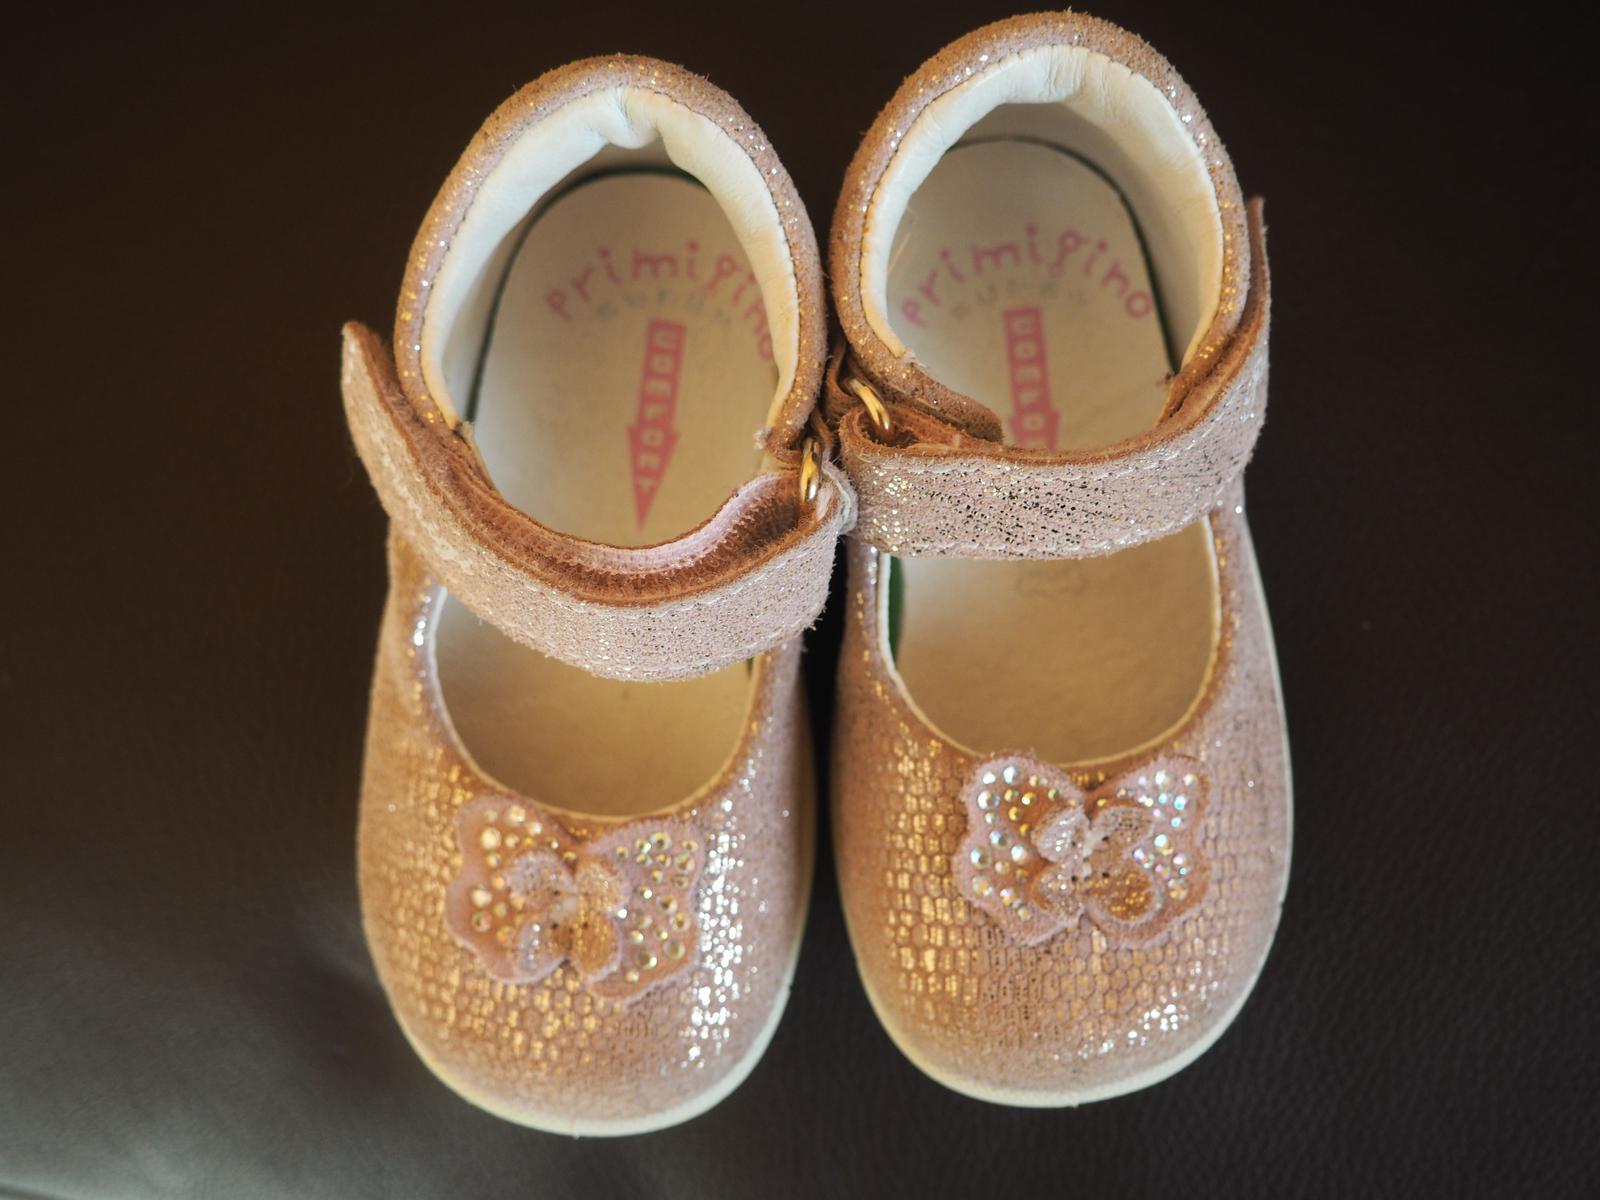 Boty sandálky primigi 5e91c6a849